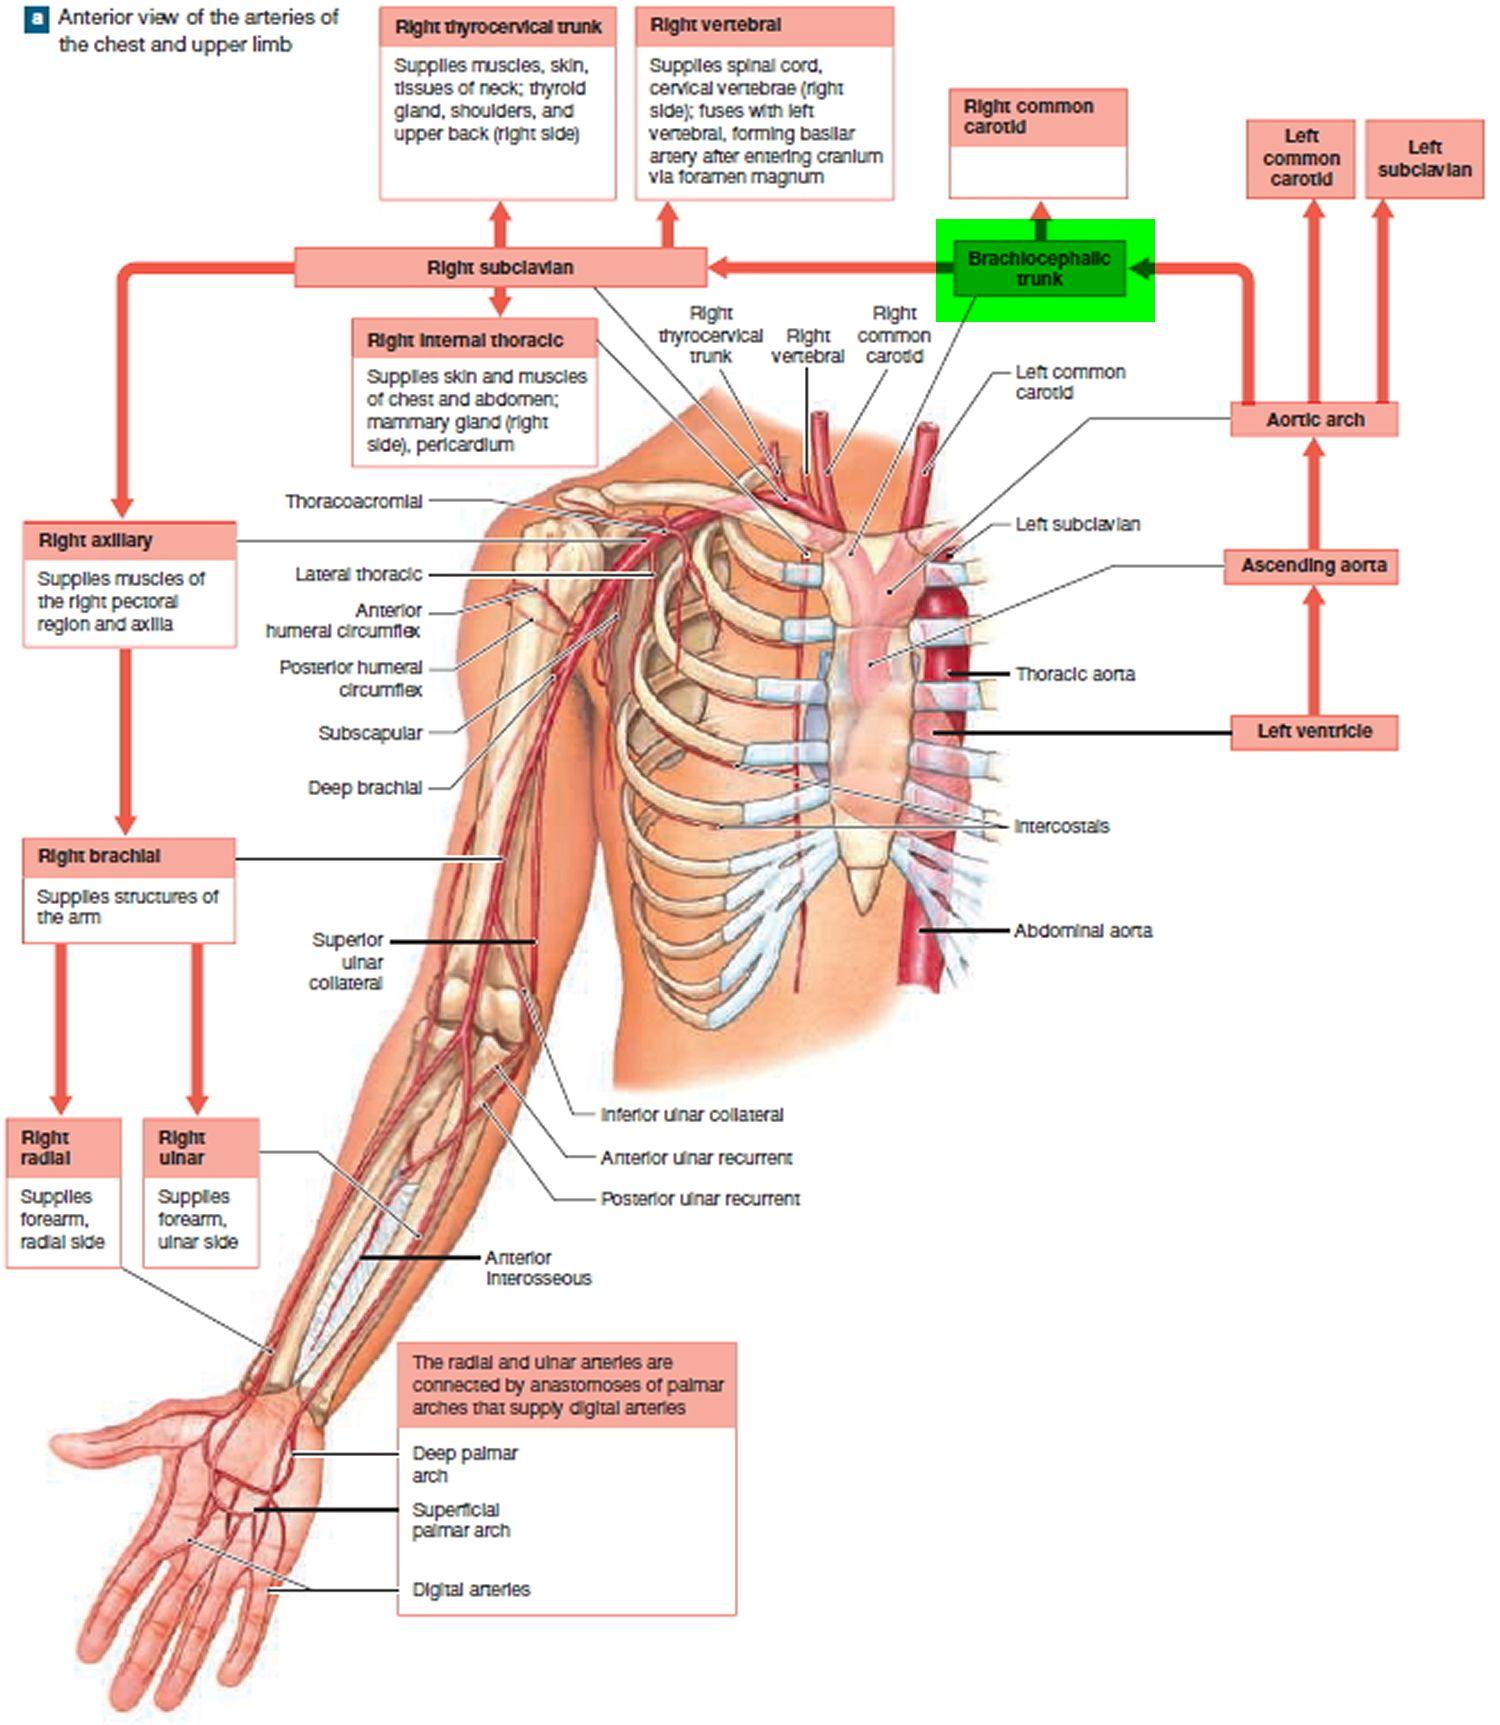 branches of the brachiocephalic artery